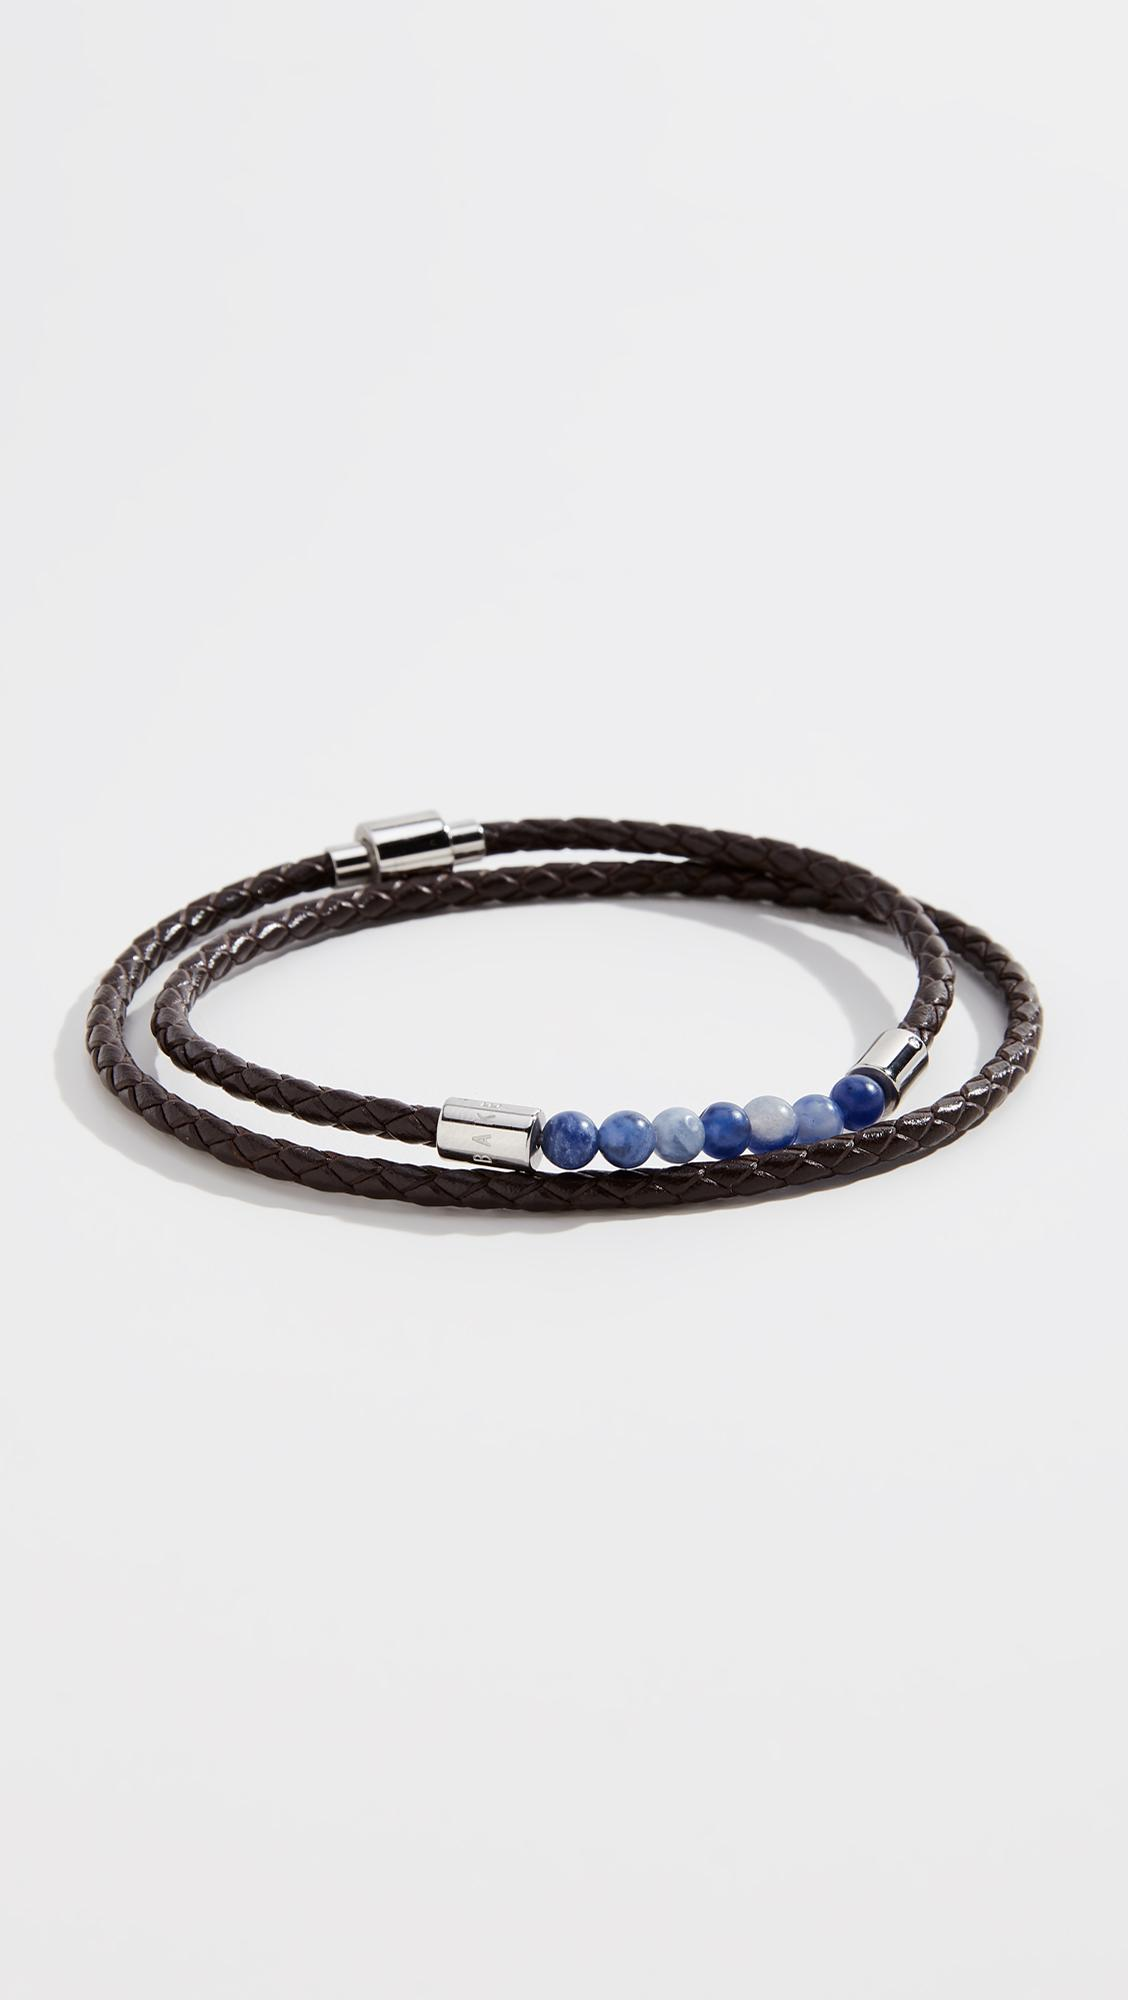 edb7c4a304fb Ted Baker Lizaa (brown) Bracelet in Brown for Men - Lyst